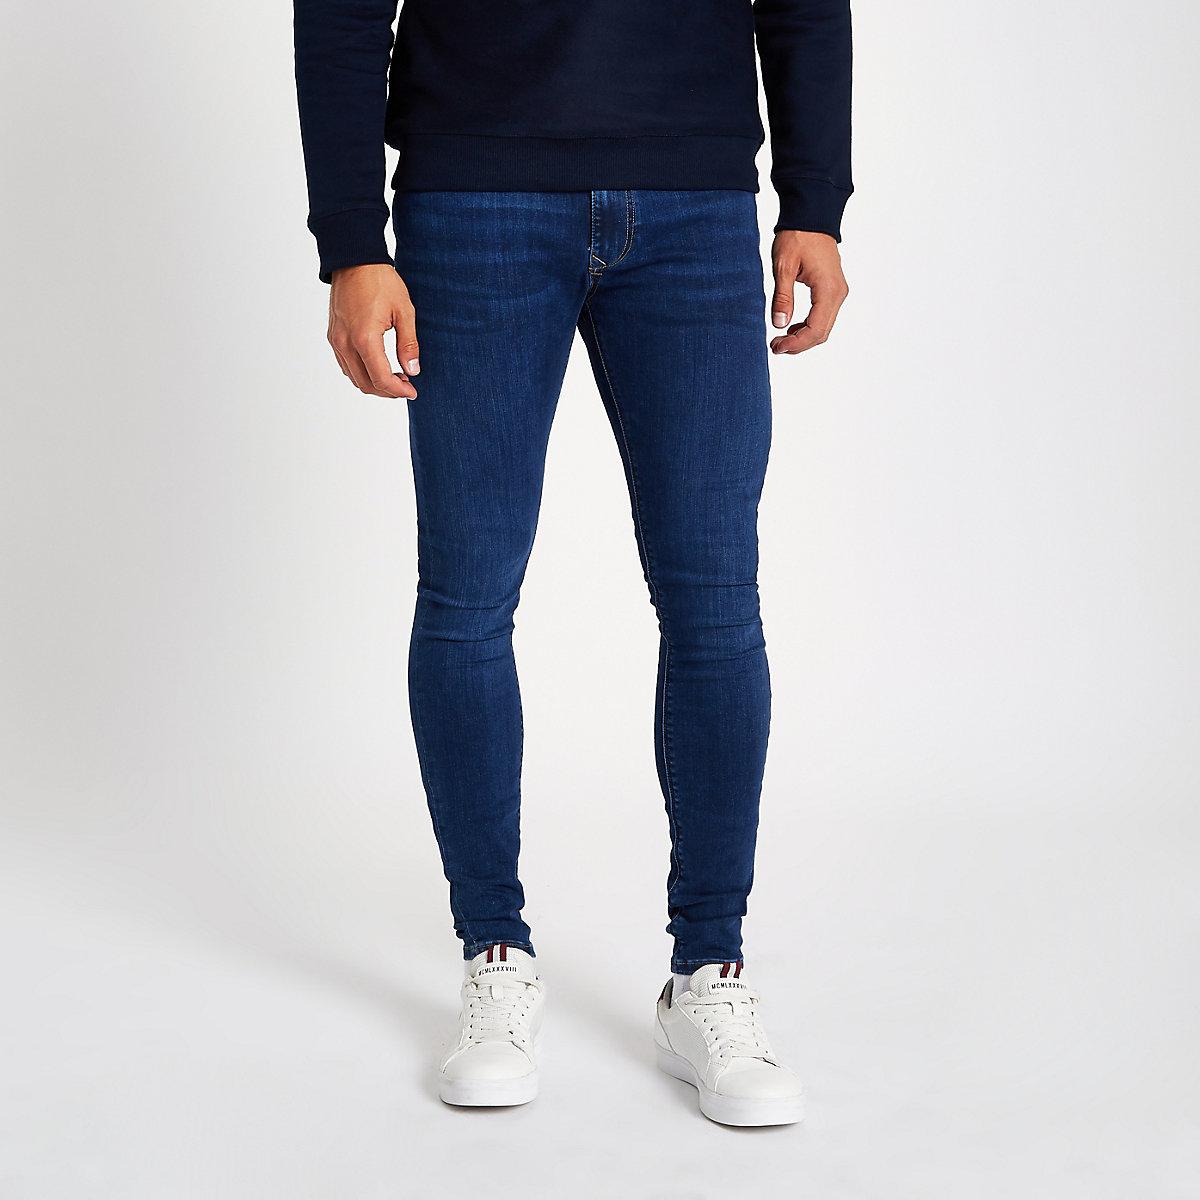 Dark blue wash Ollie skinny spray on jeans